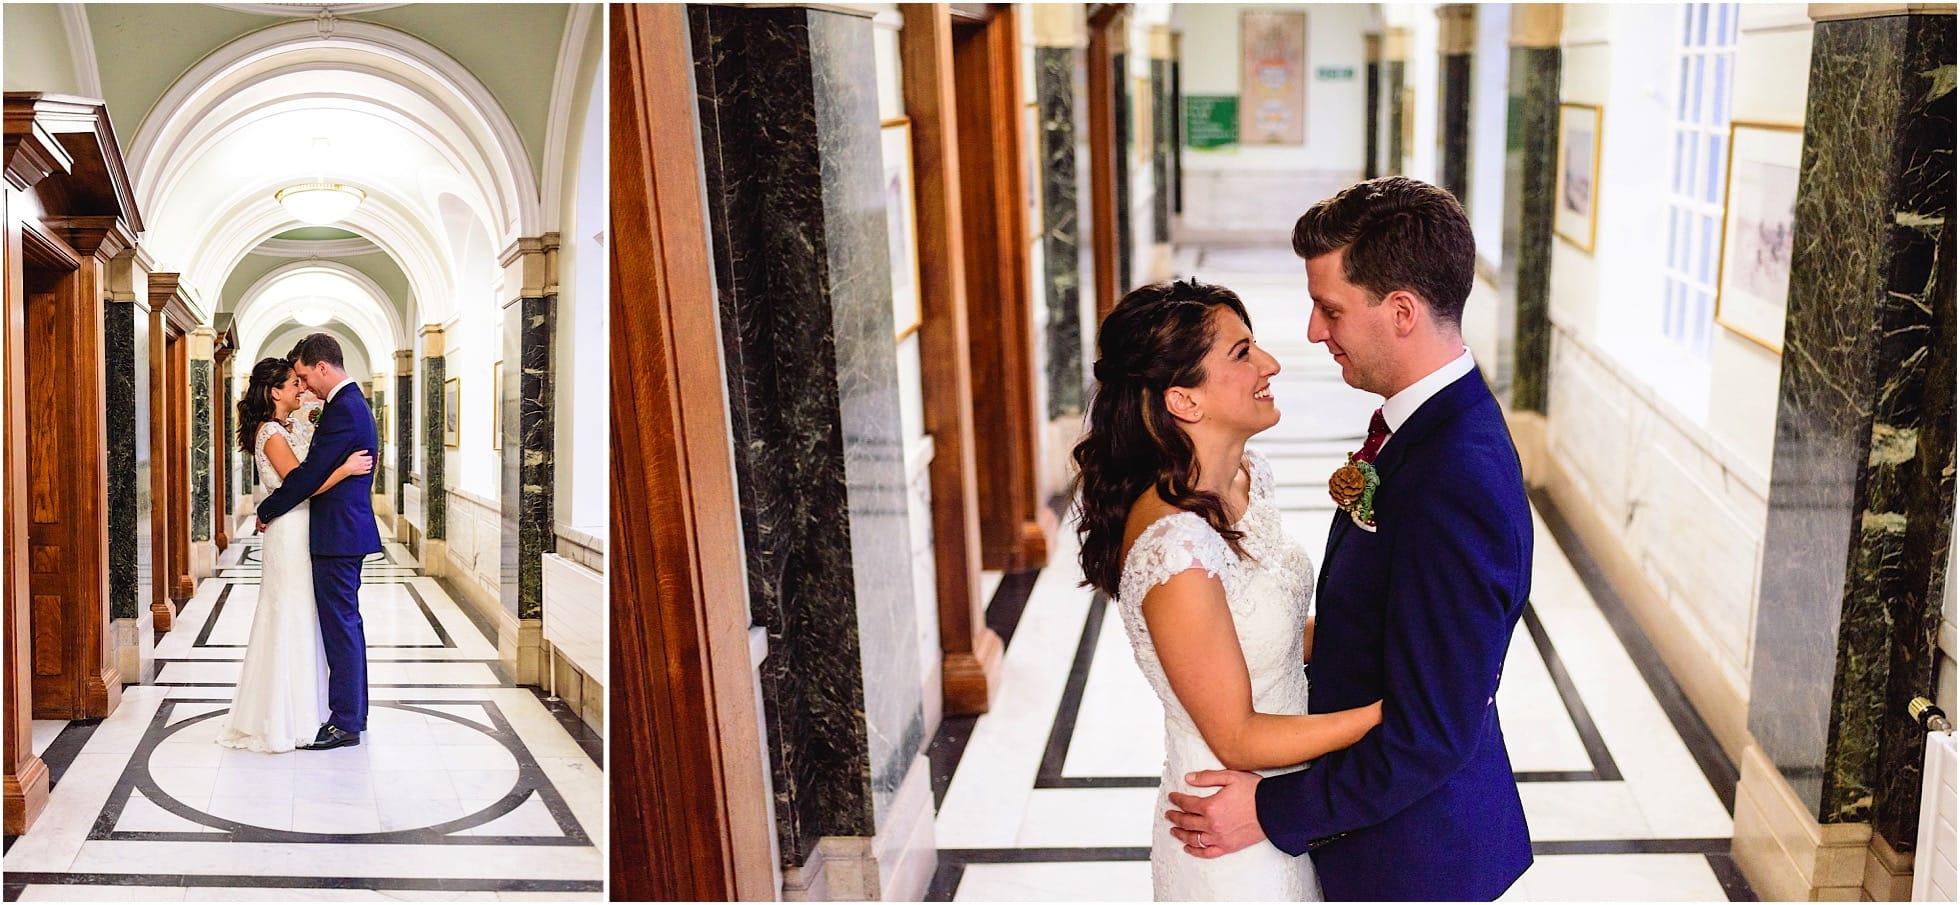 corridors of islington town hall for wedding photos